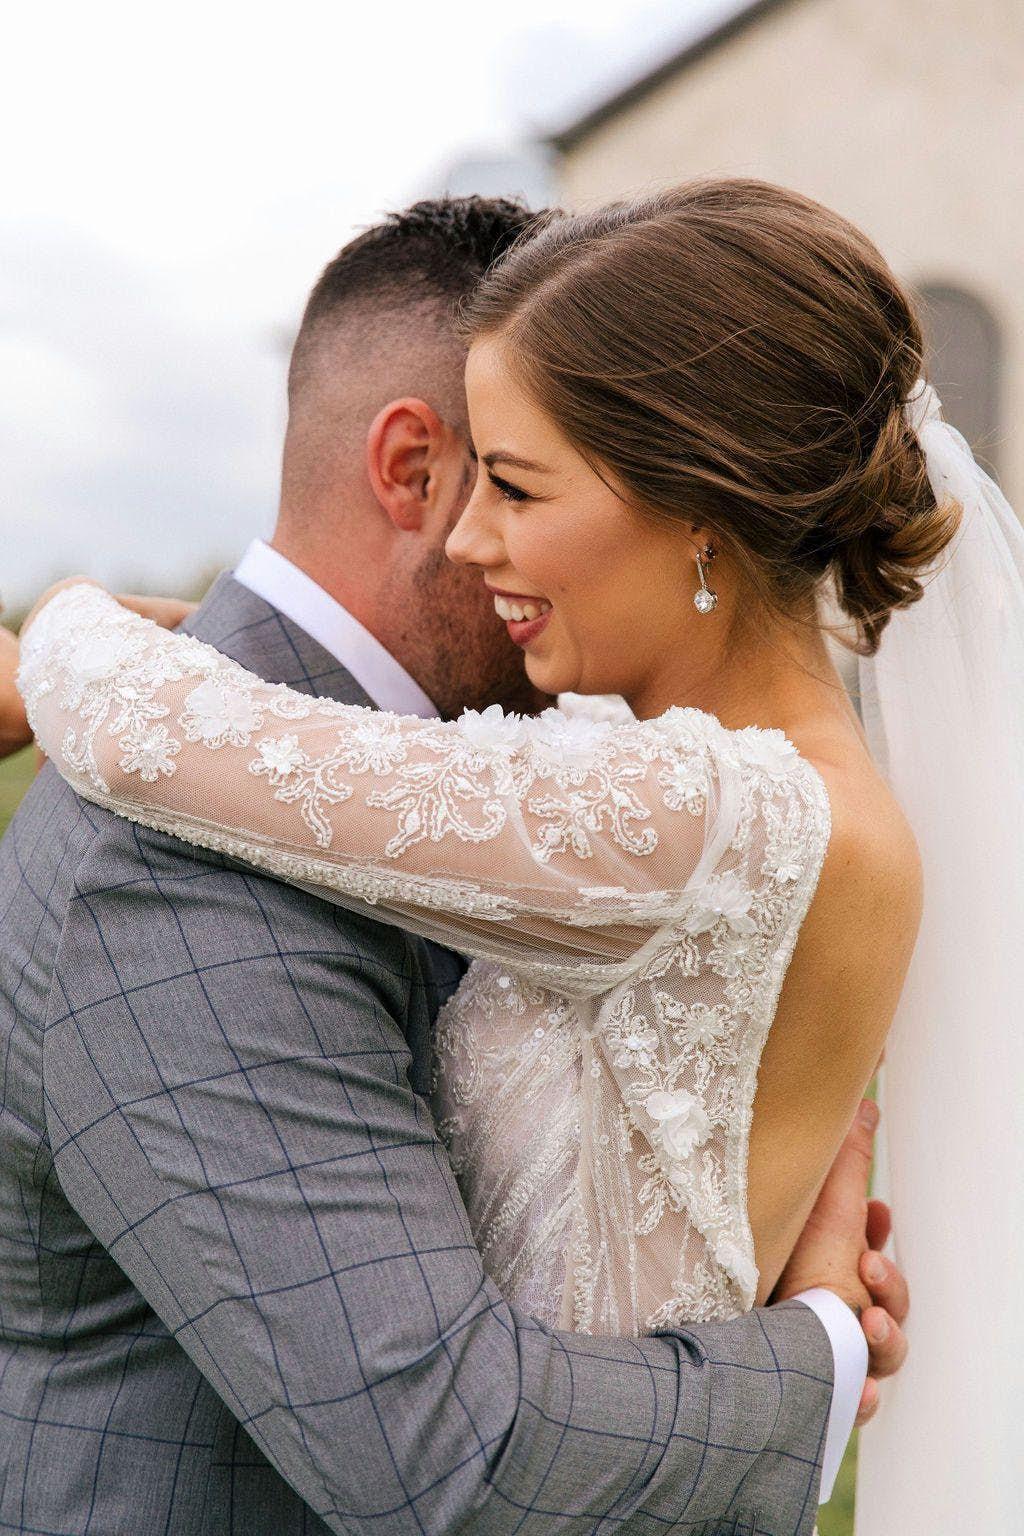 Stones of the Yarra Valley Wedding Photographer - Mornington Peninsula Wedding Photographer